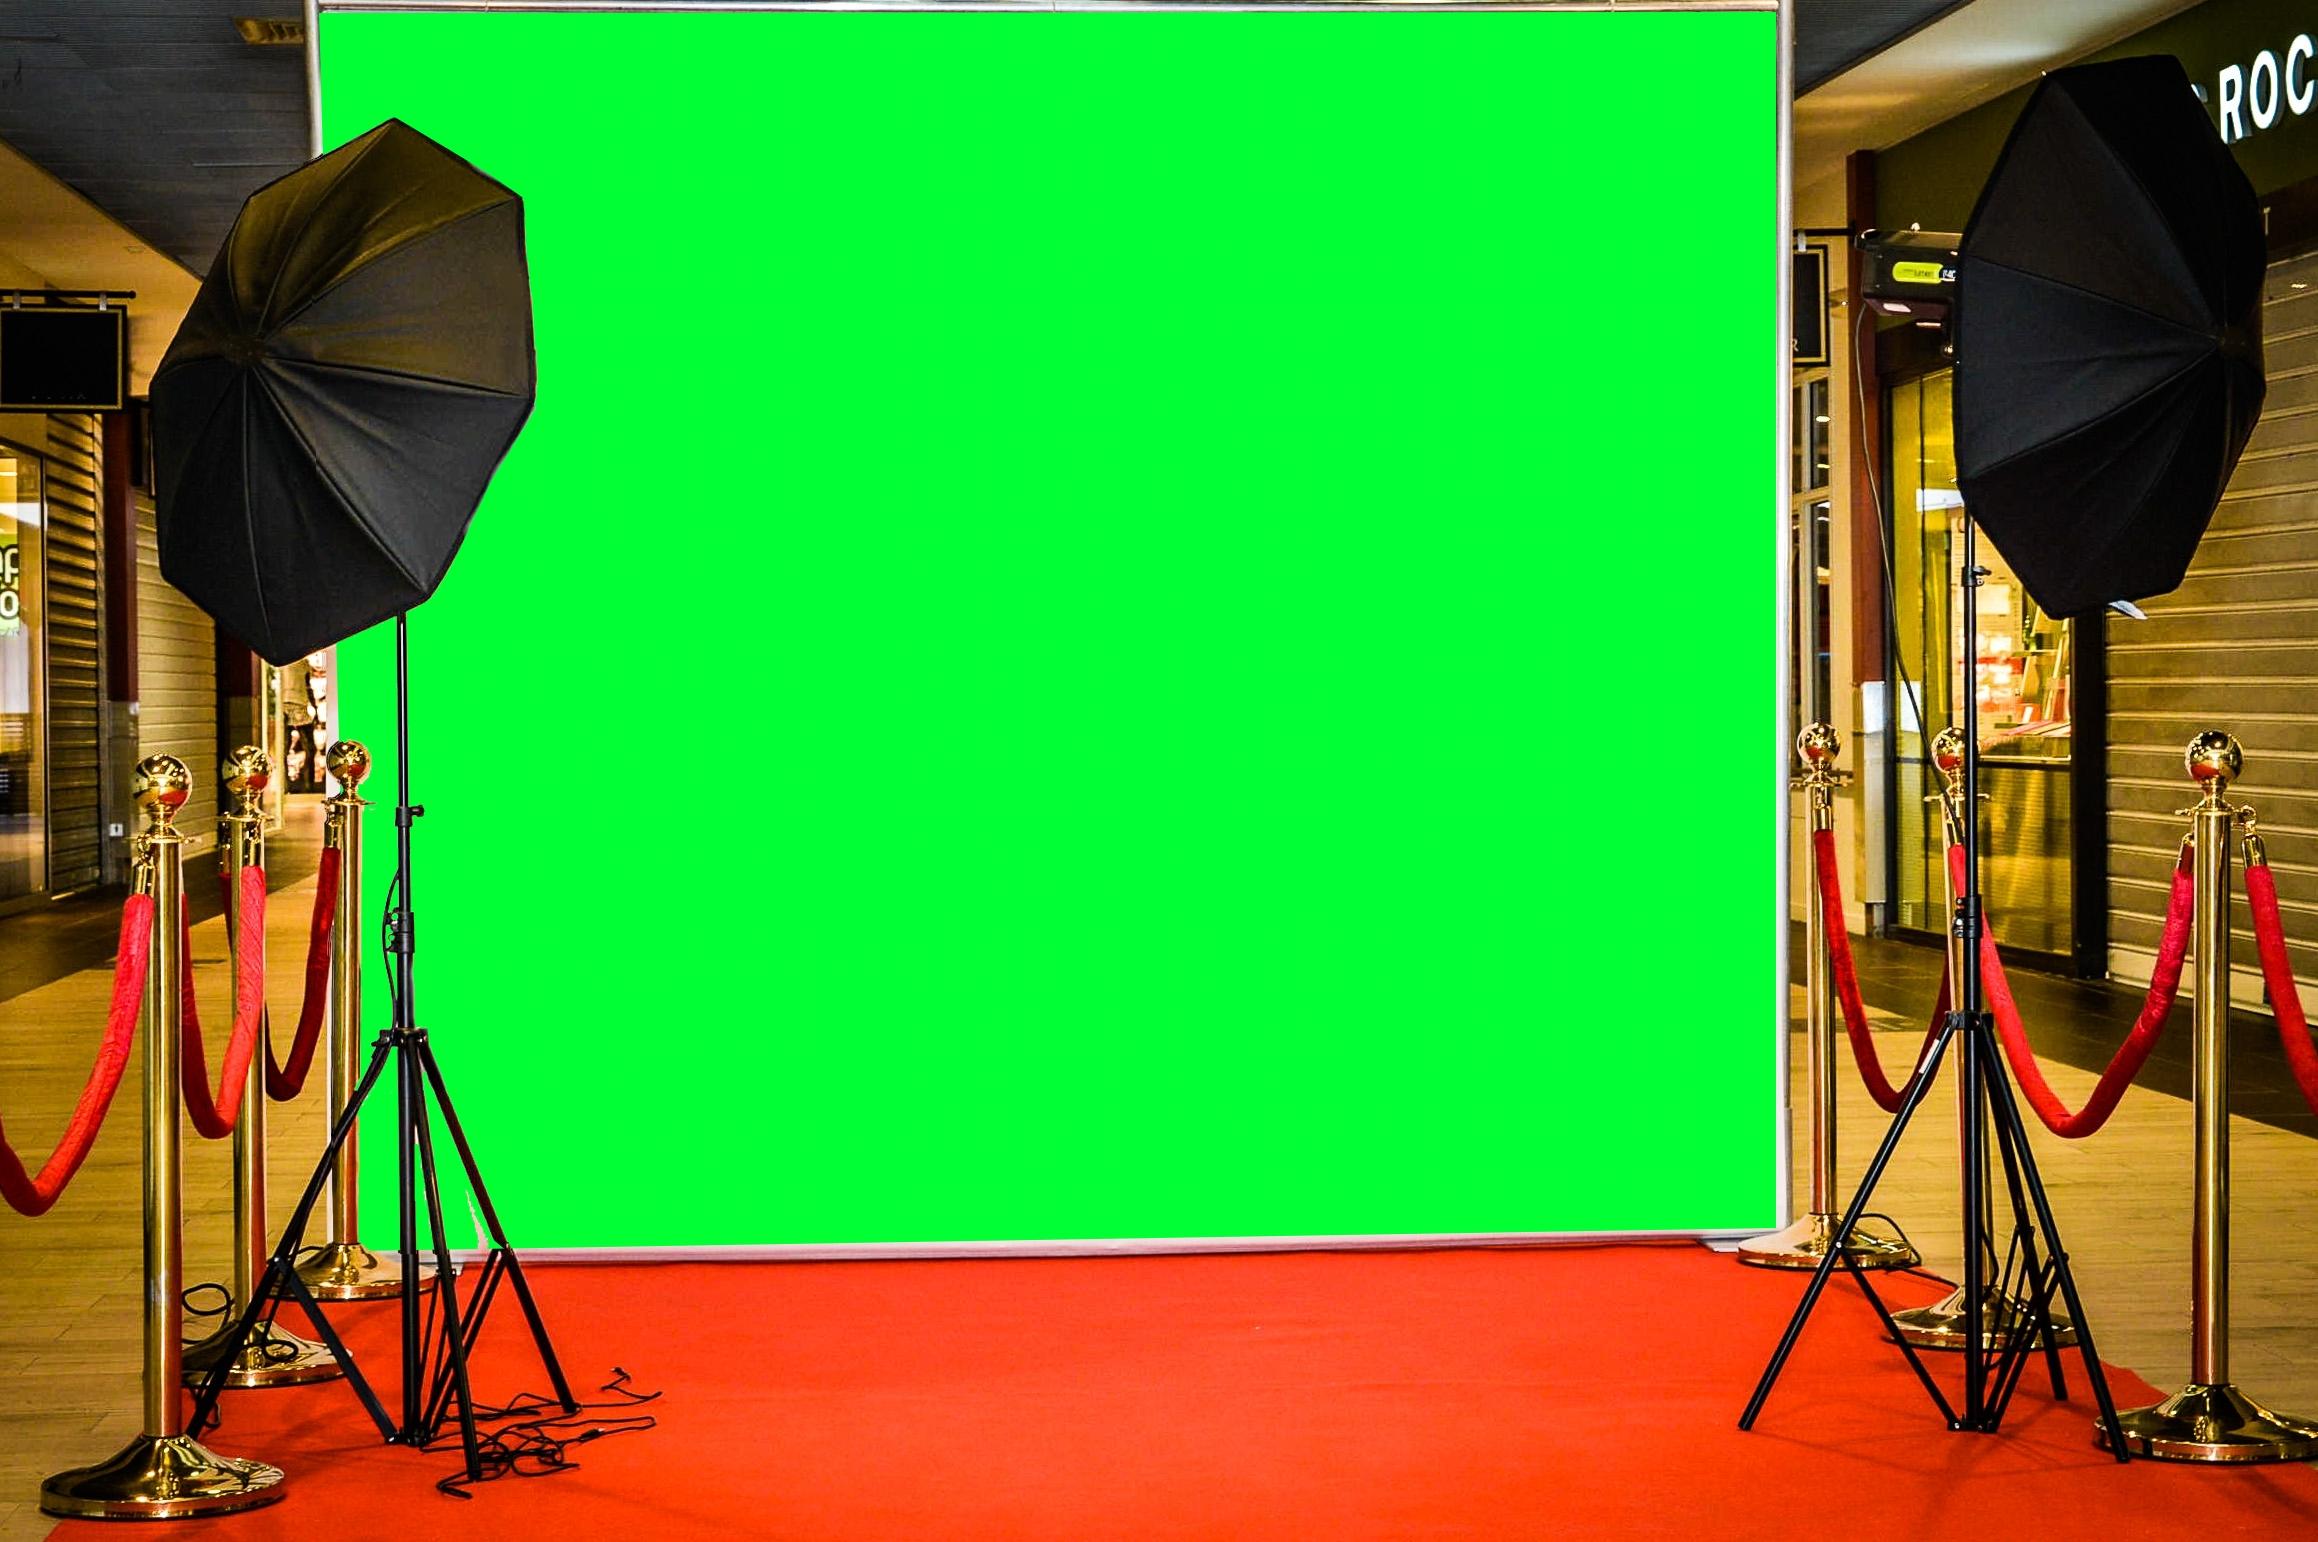 Toile photocall pour prise photo et video - vente location - fond vert